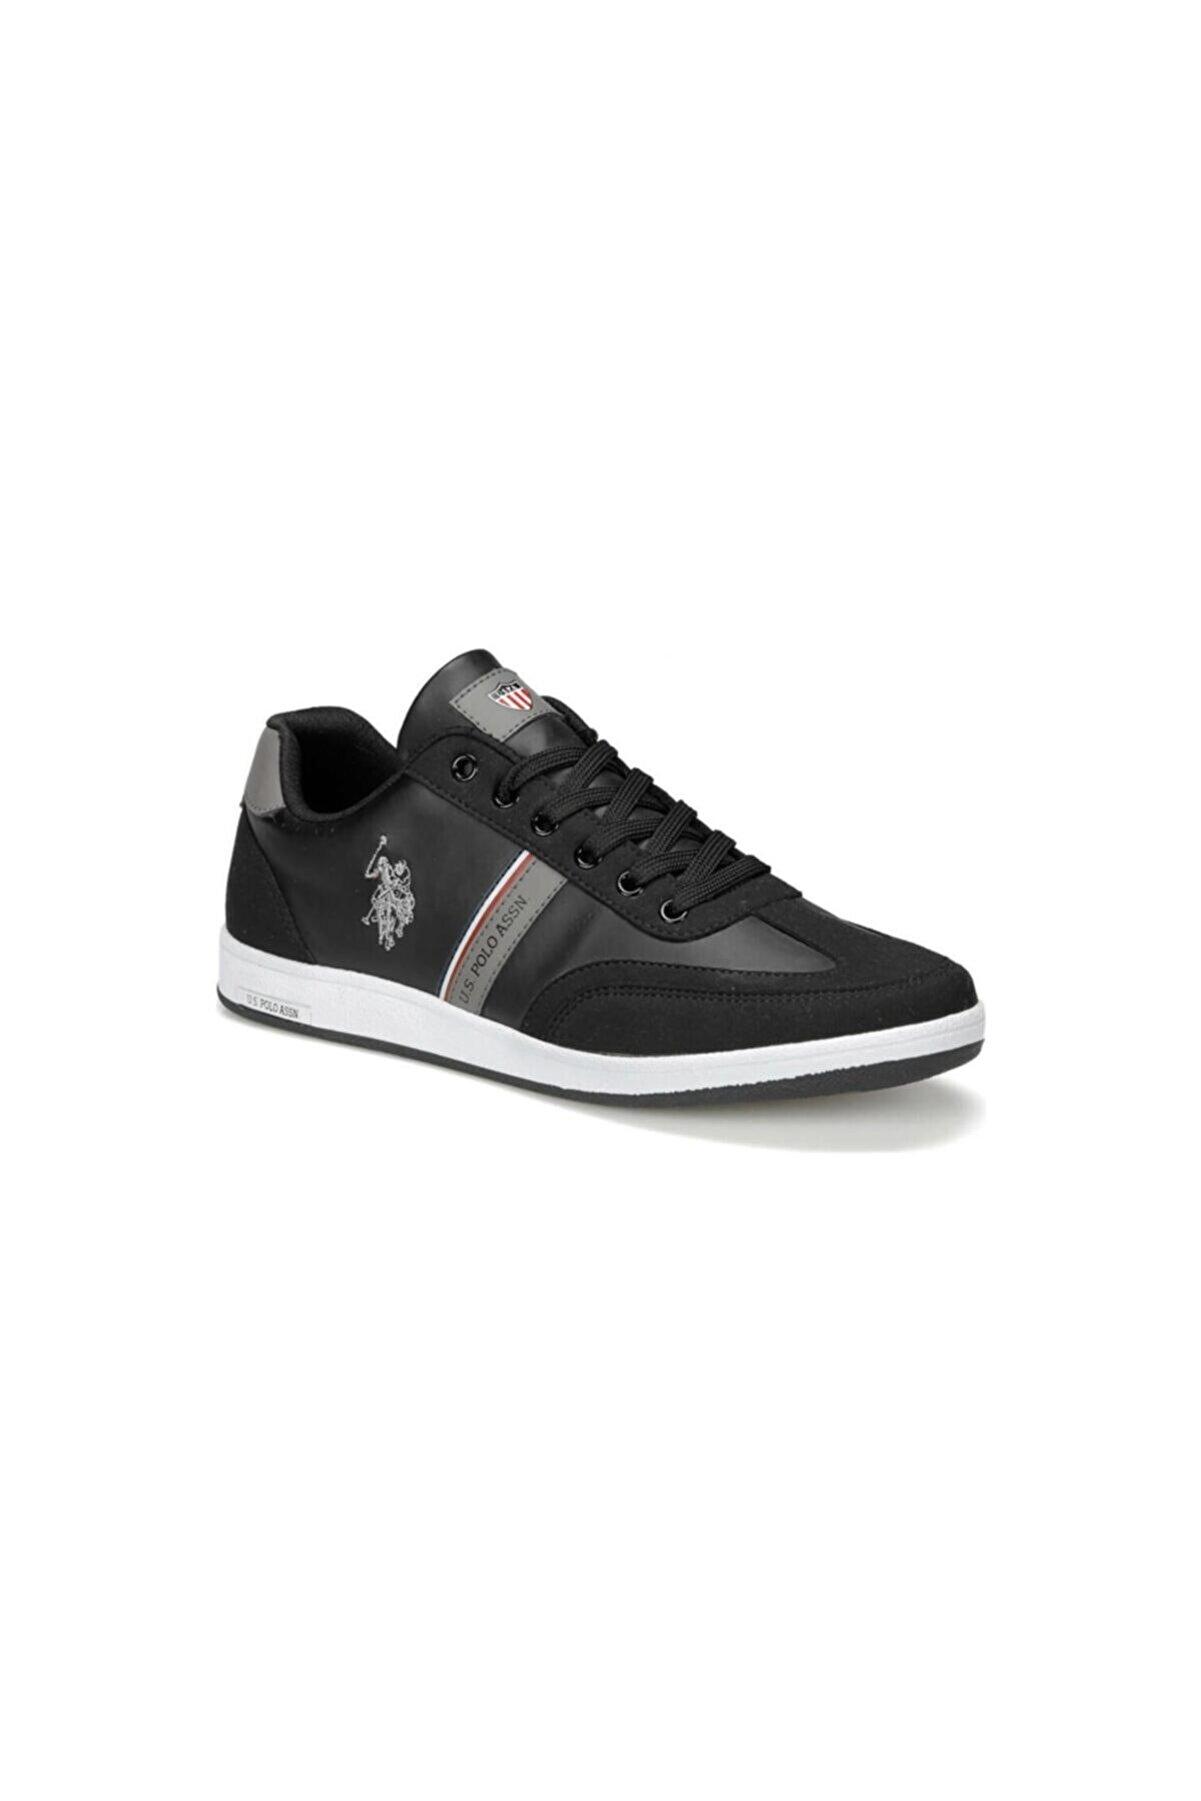 US Polo Assn KARES WT 9PR Siyah Erkek Sneaker Ayakkabı 100417978